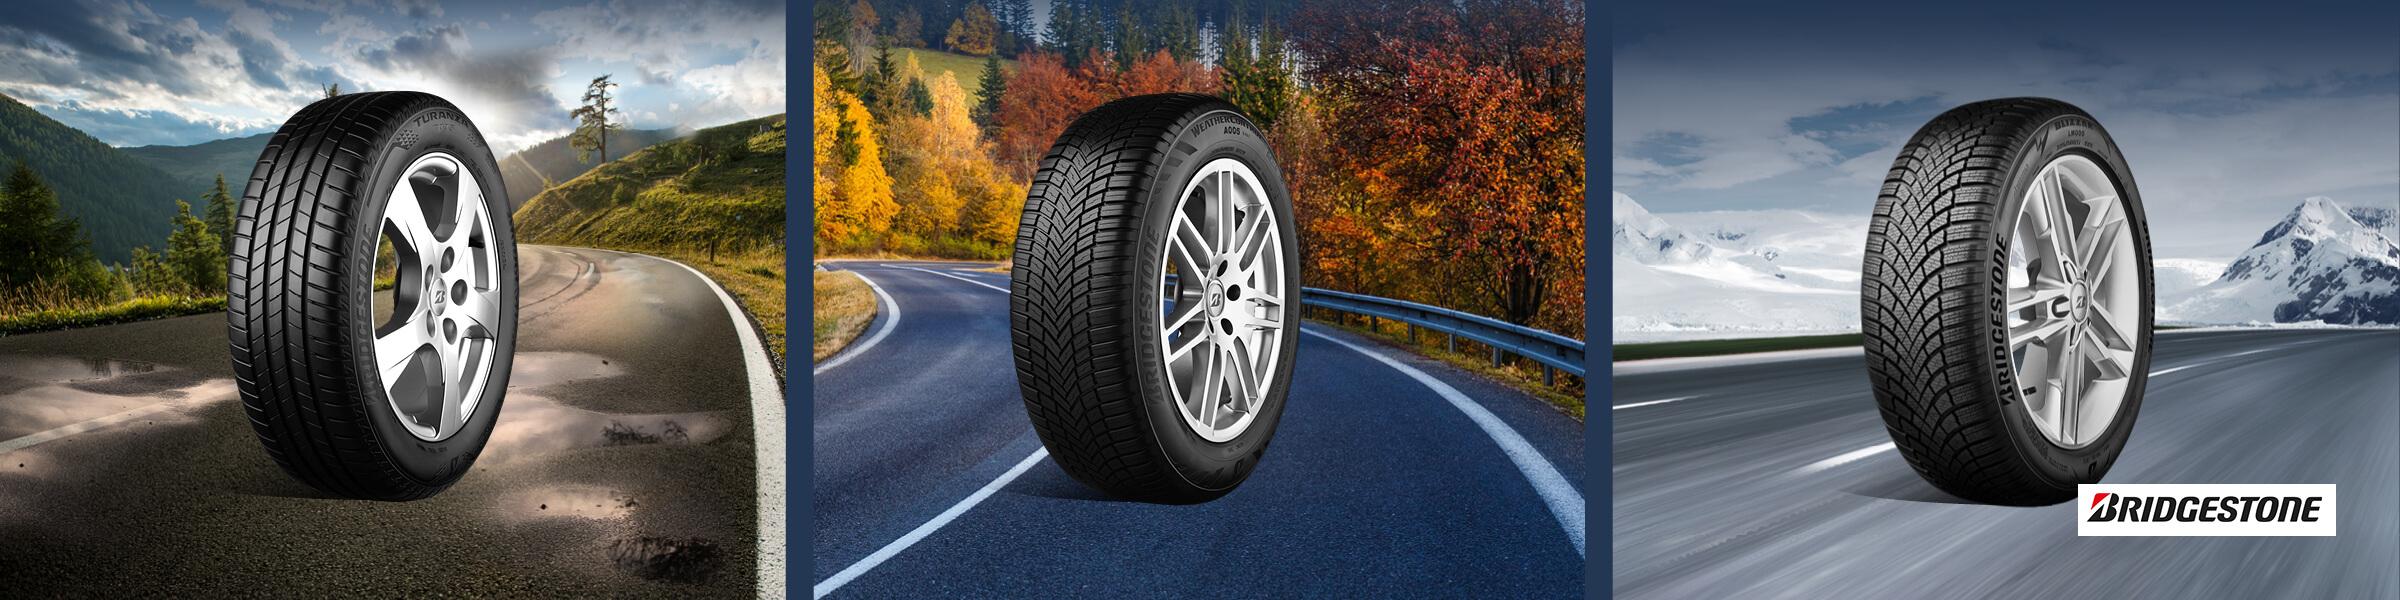 Bridgestone Header